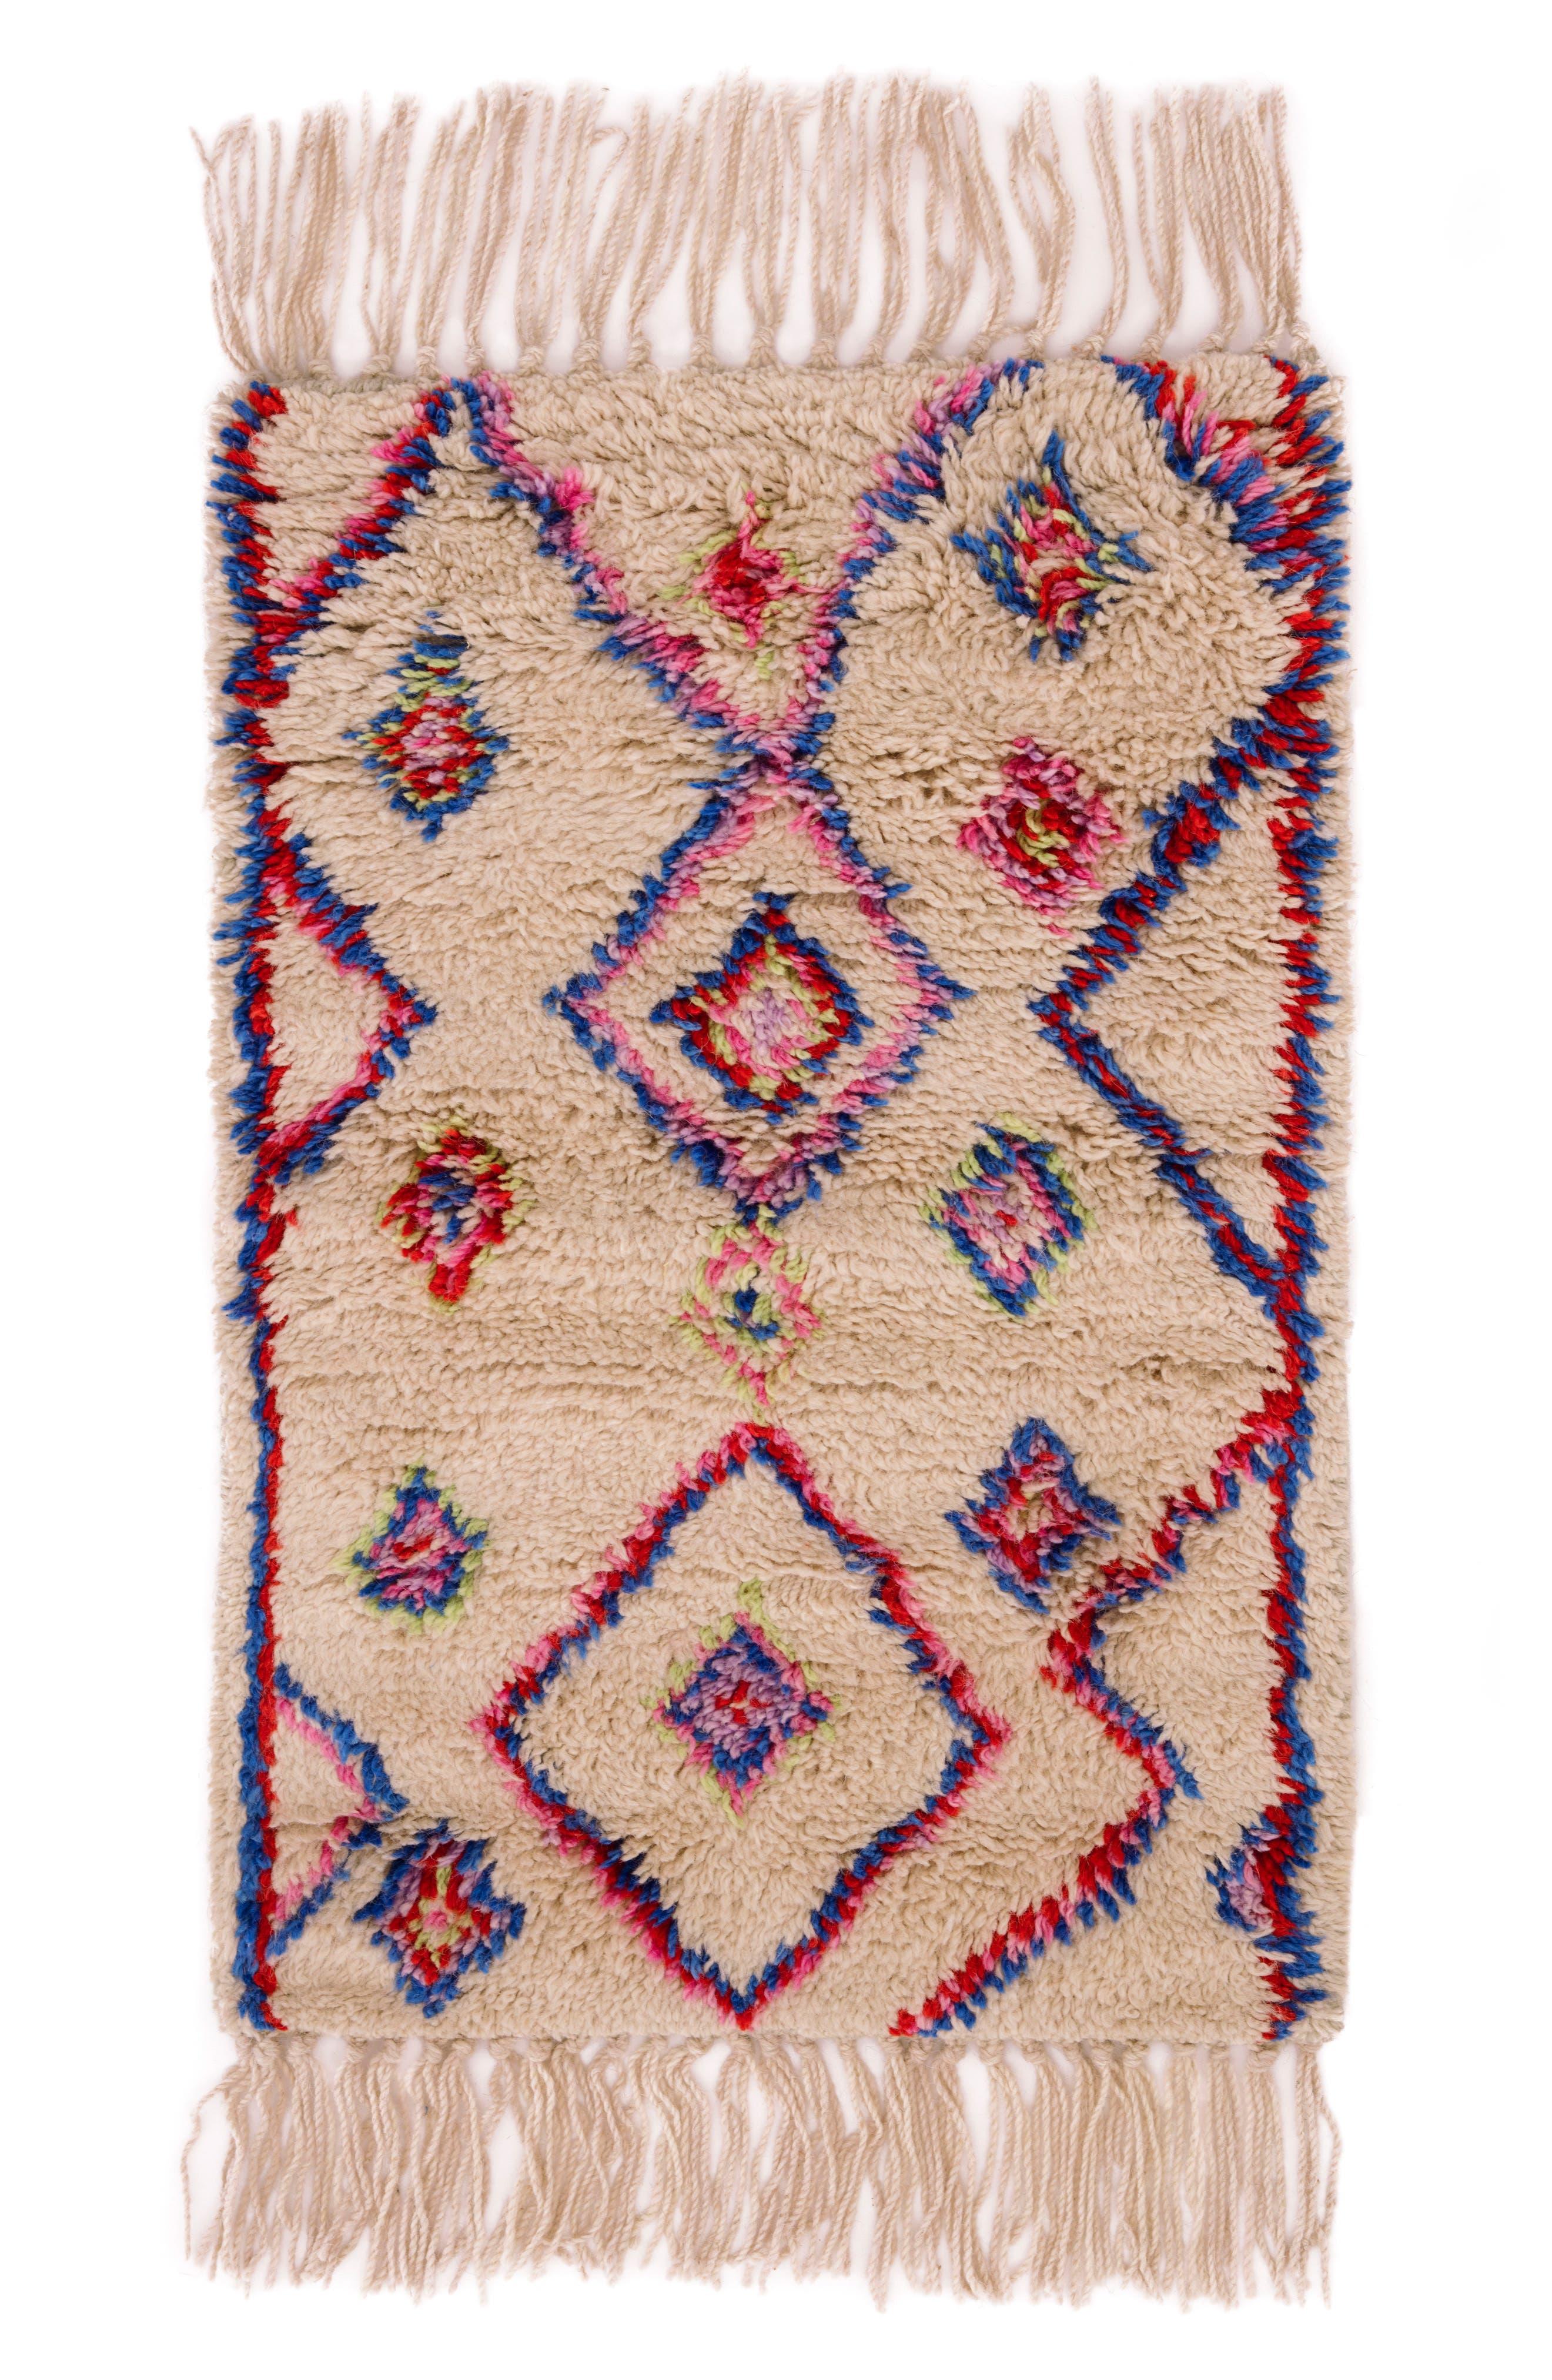 Tilda Hand Knotted Wool Blend Rug,                         Main,                         color, Natural